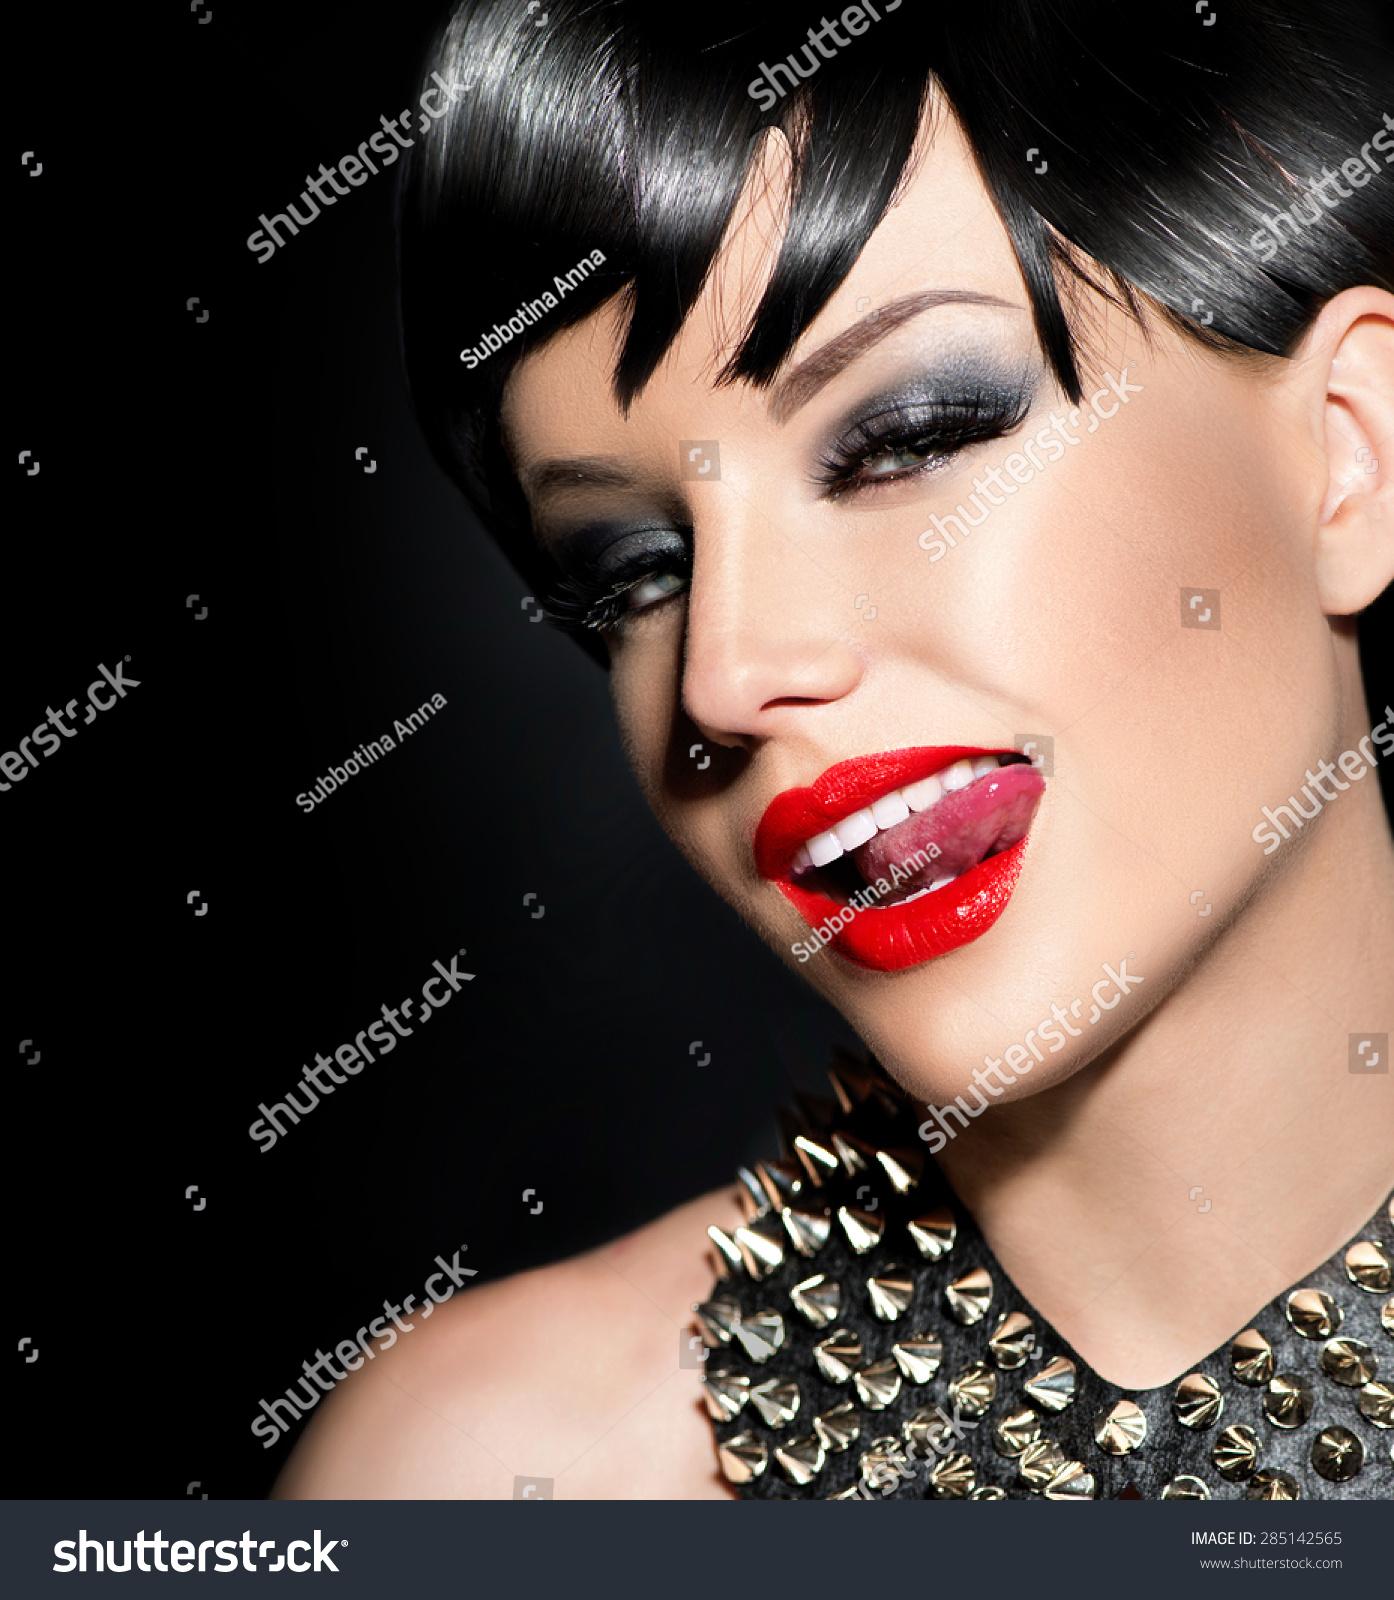 Beauty Sexy Punk Fashion Model Girl Stock Photo - Haircut girl model